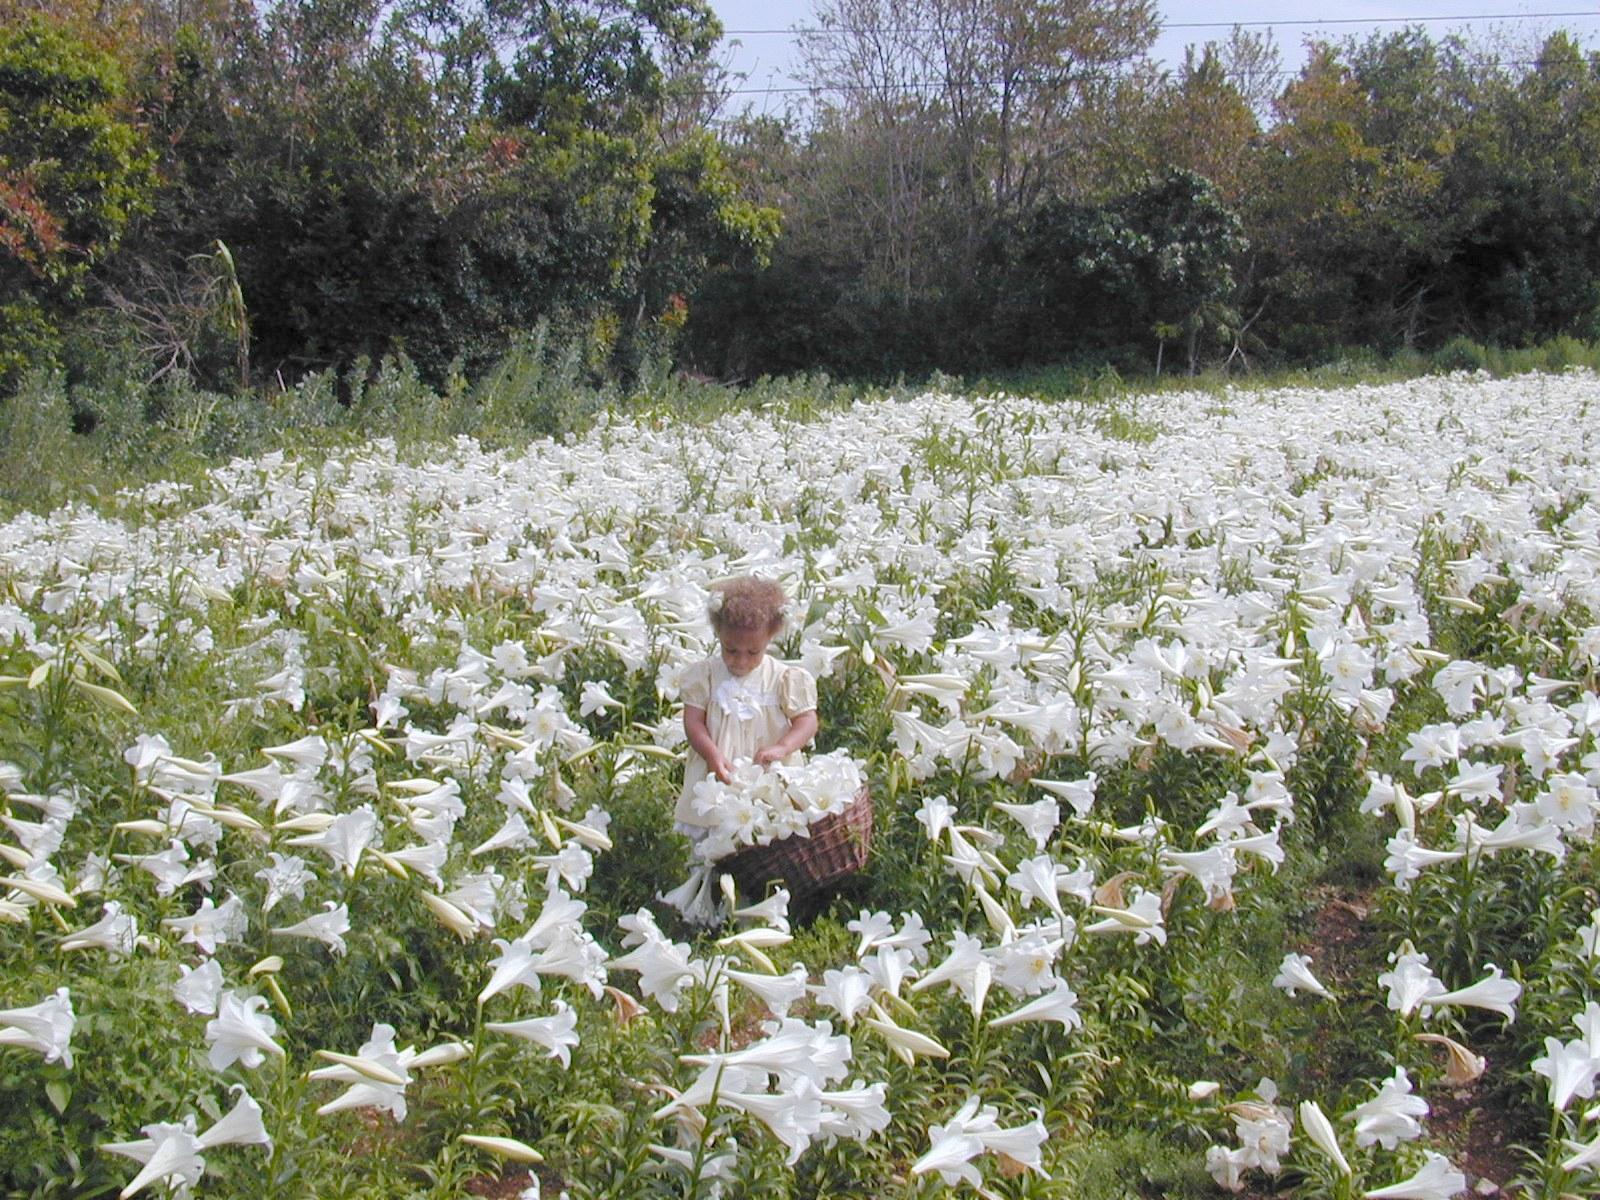 Picking Easter Lillies in Bermuda